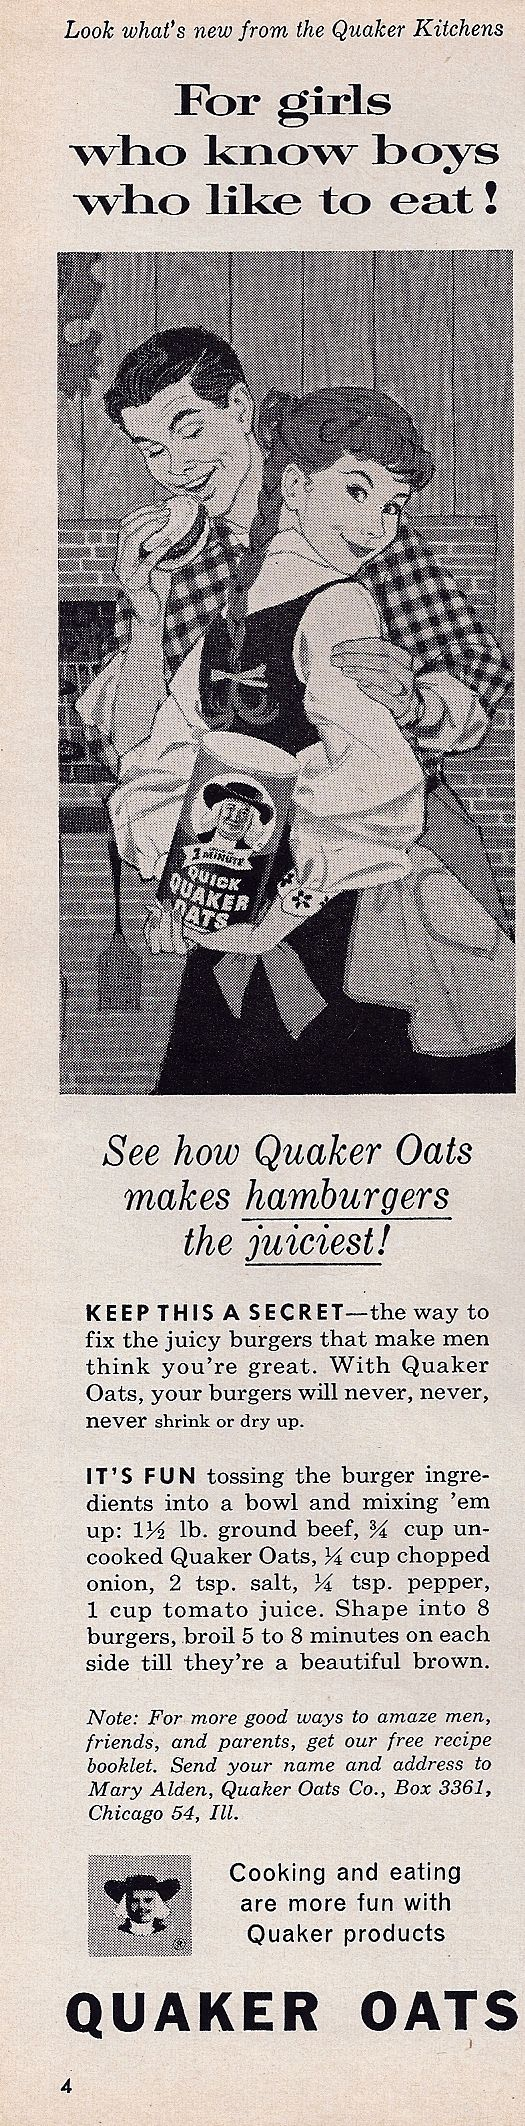 Quaker Oats hamburger recipe 1959 - funny. That's how my mom made them!